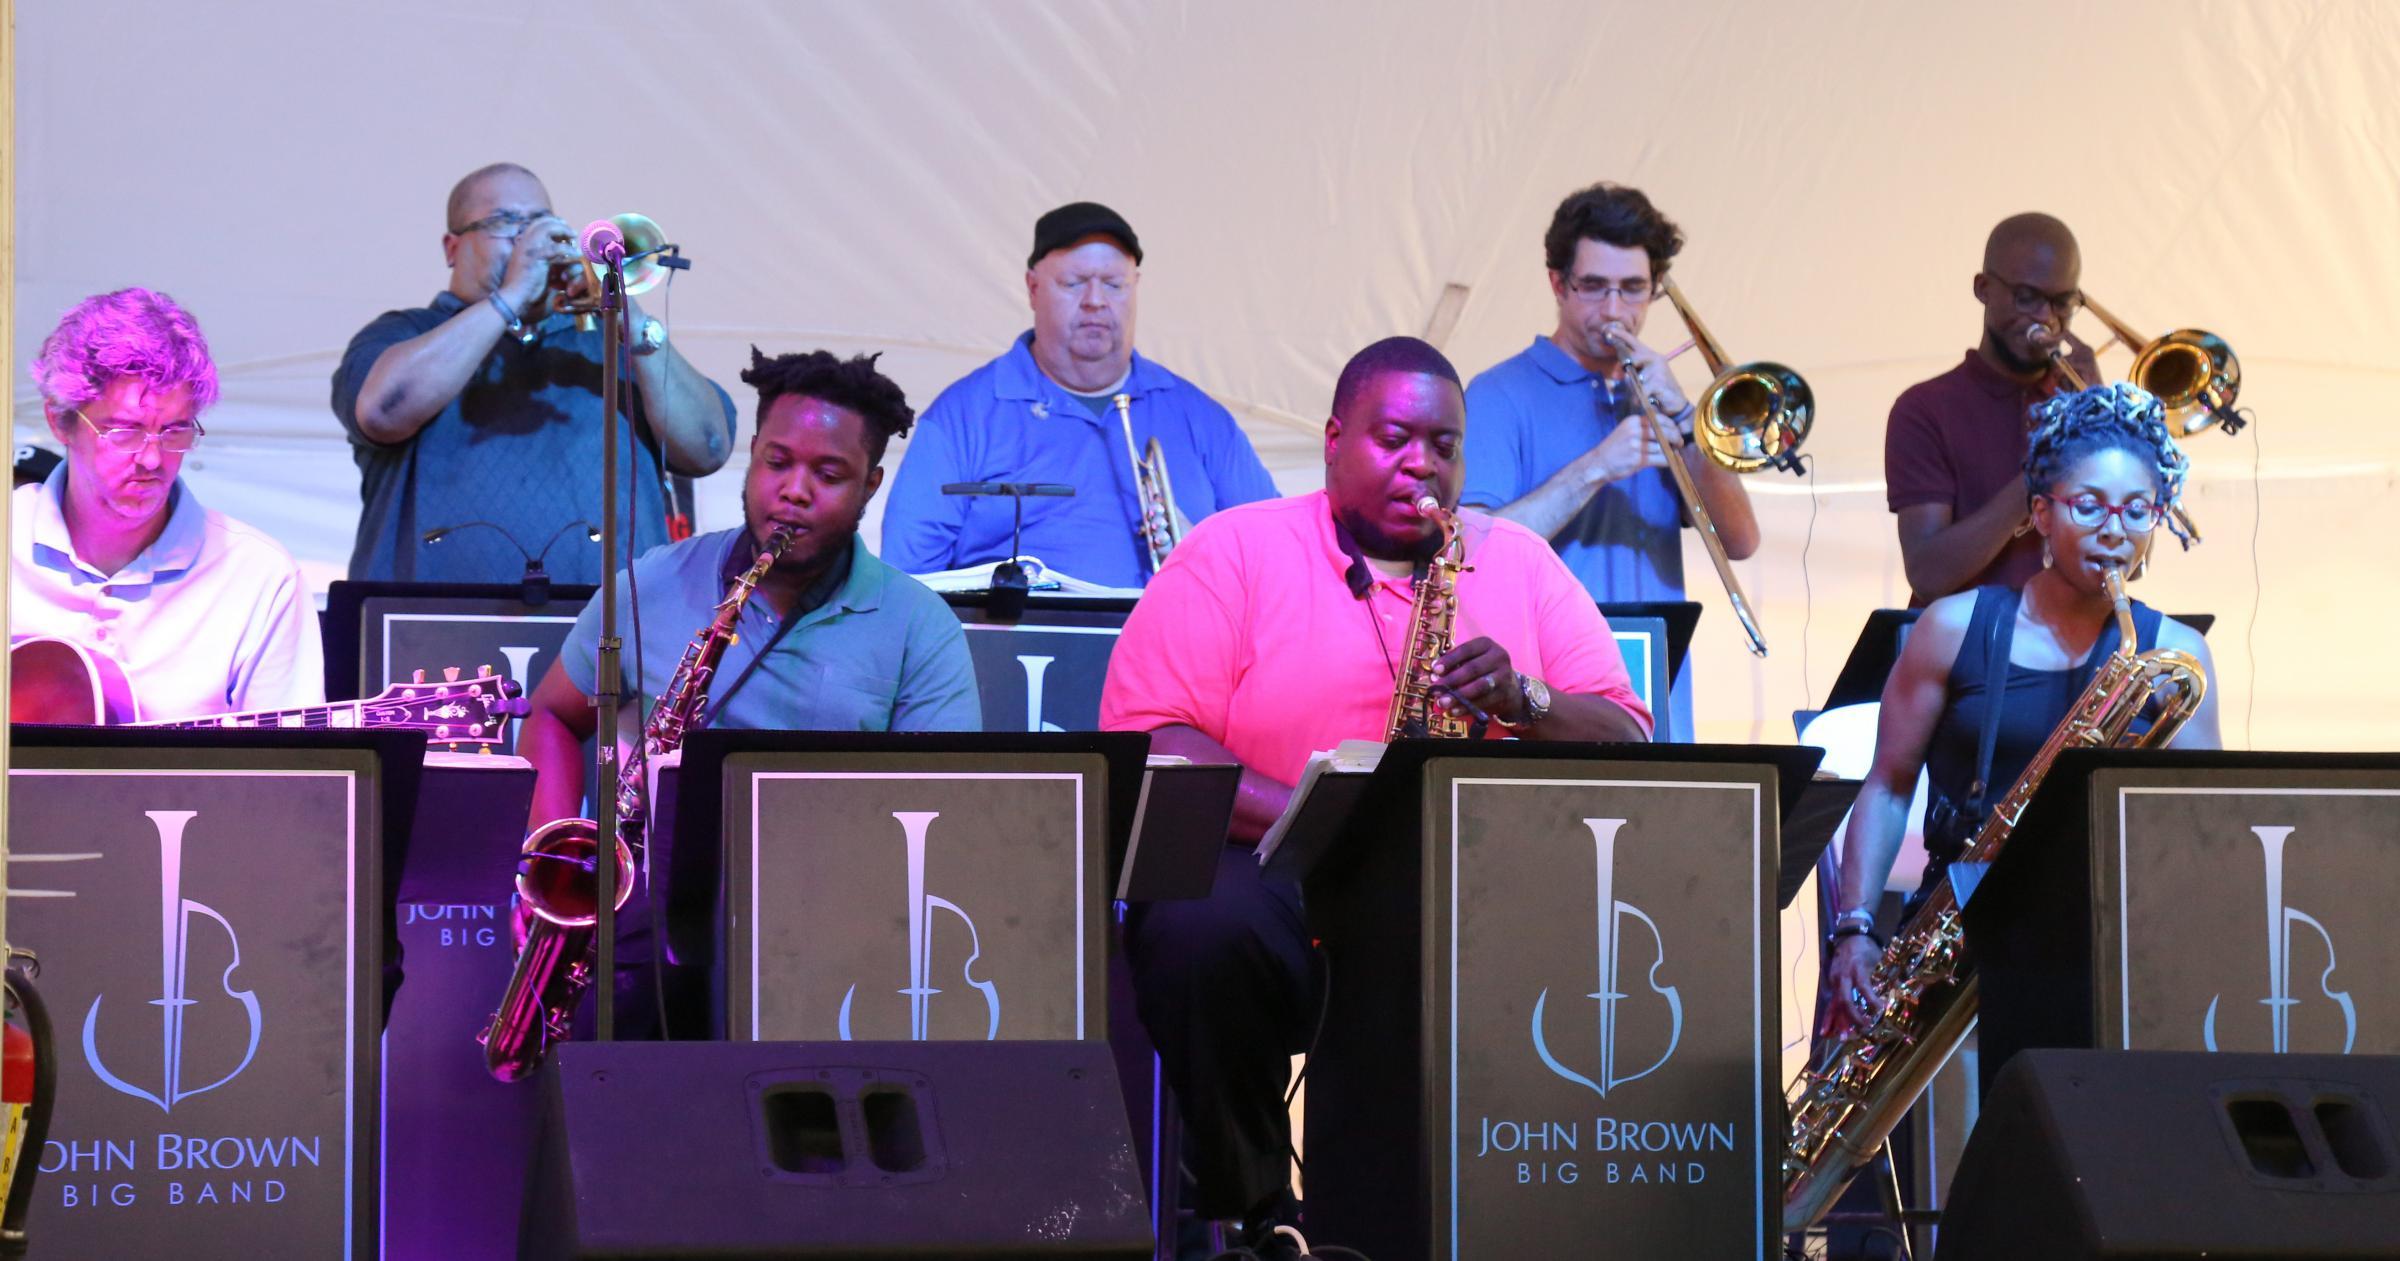 John Brown Big Band performing at Ocean City Jazz 2019